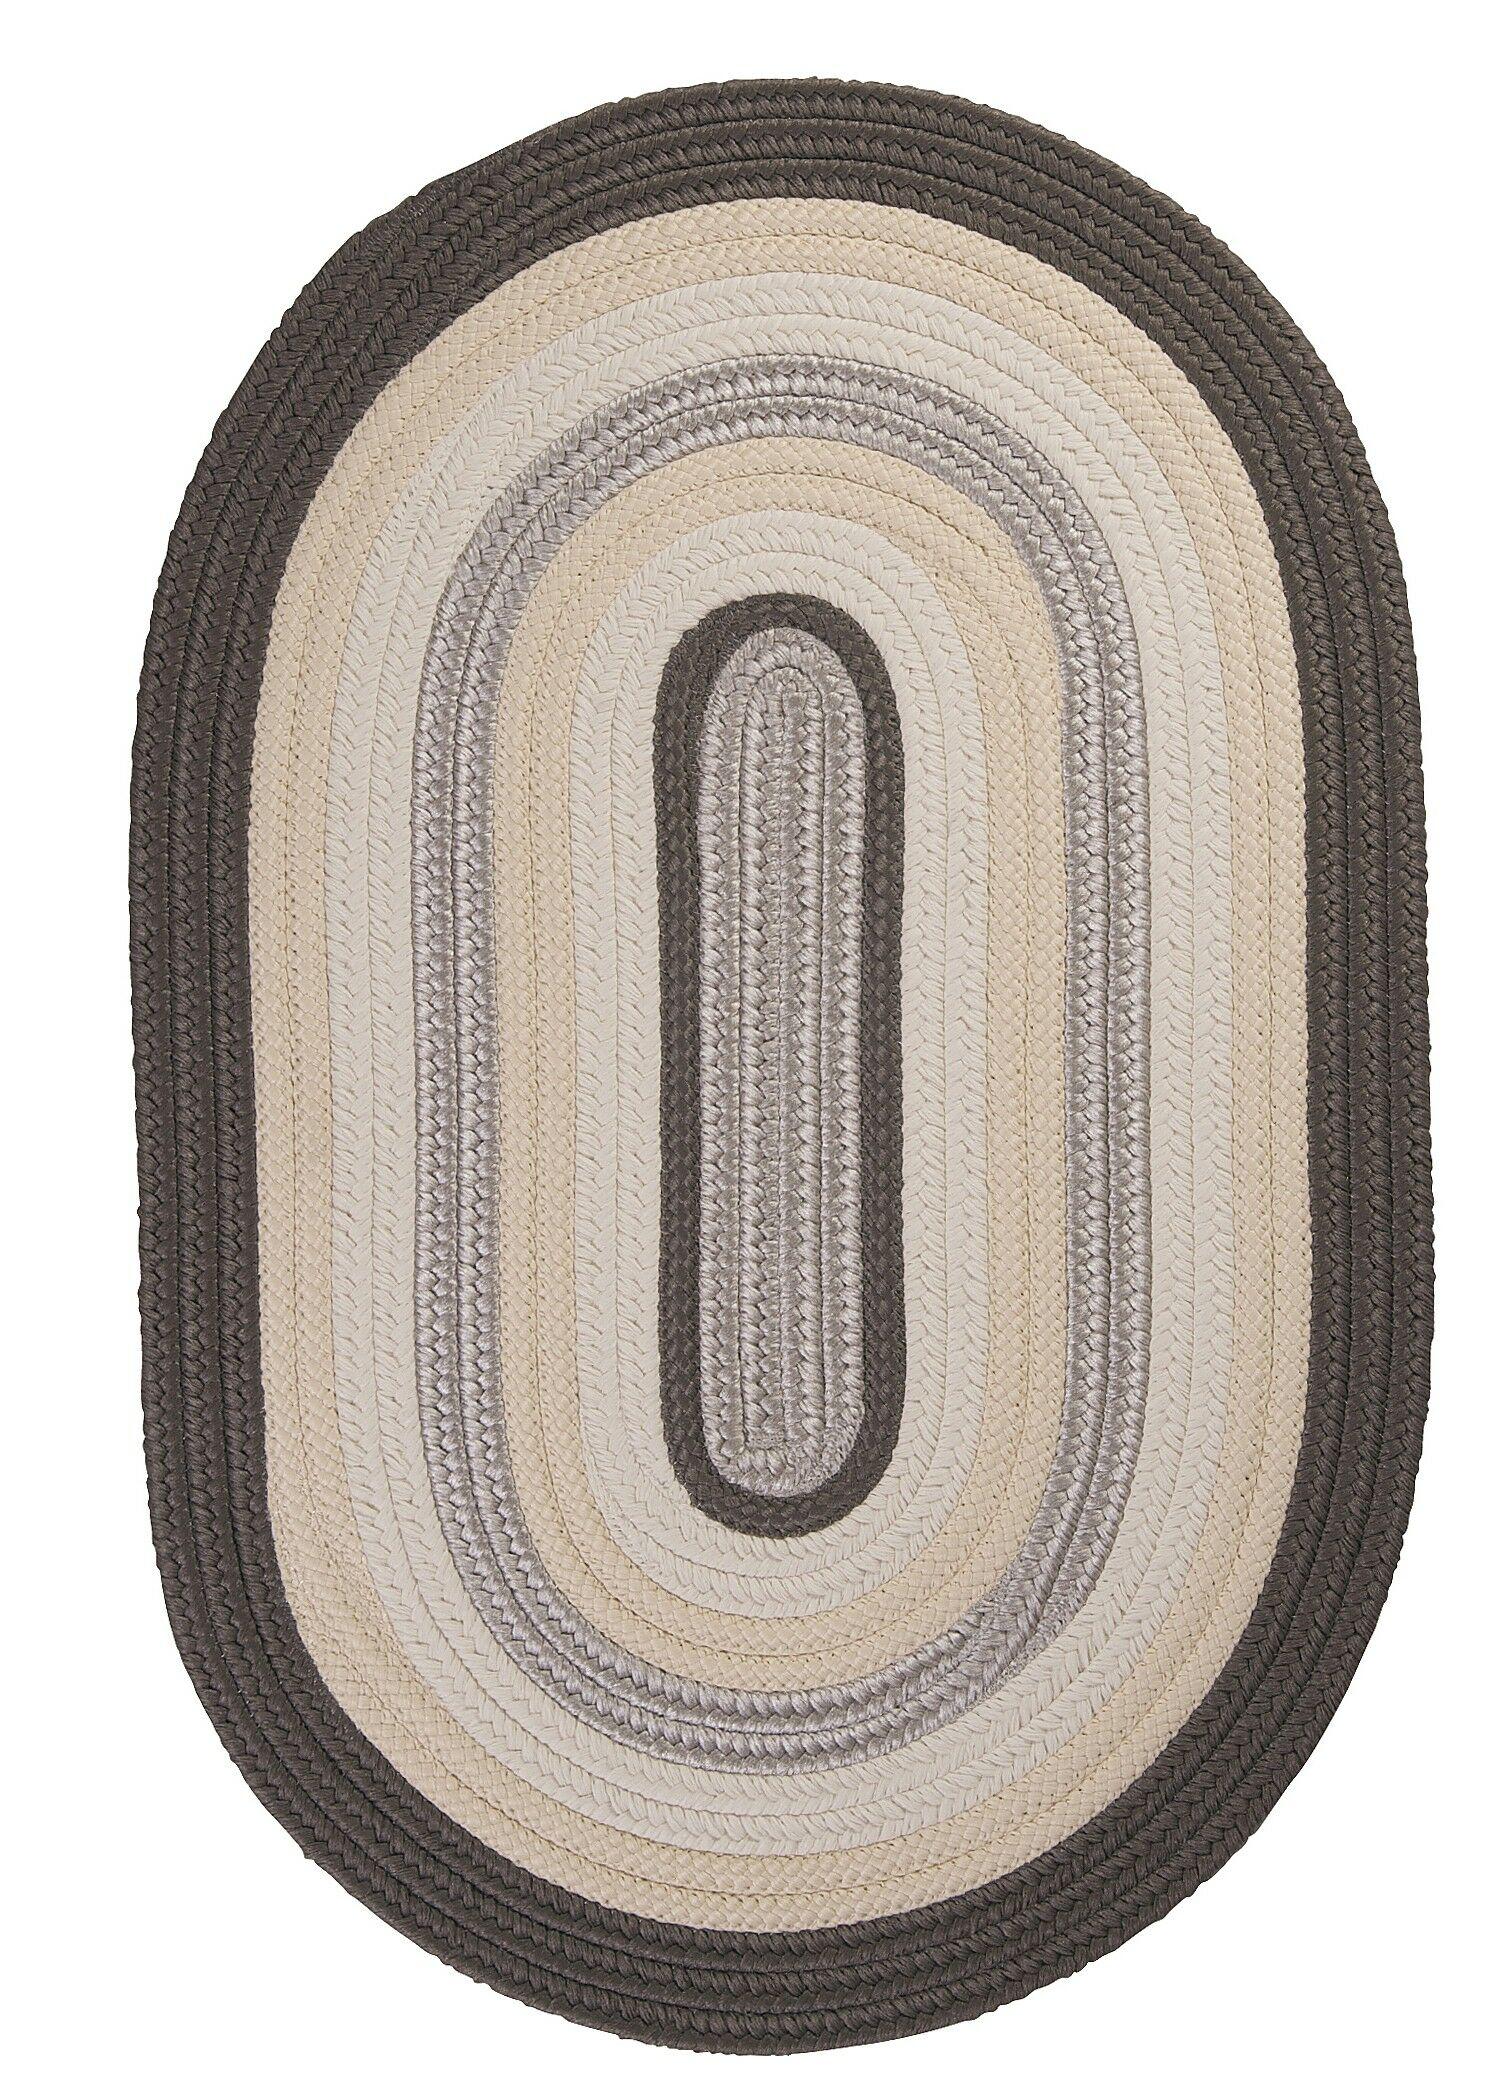 Brooklyn Slate Braided Indoor/Outdoor Area Rug Rug Size: Rectangle 8' x 11'